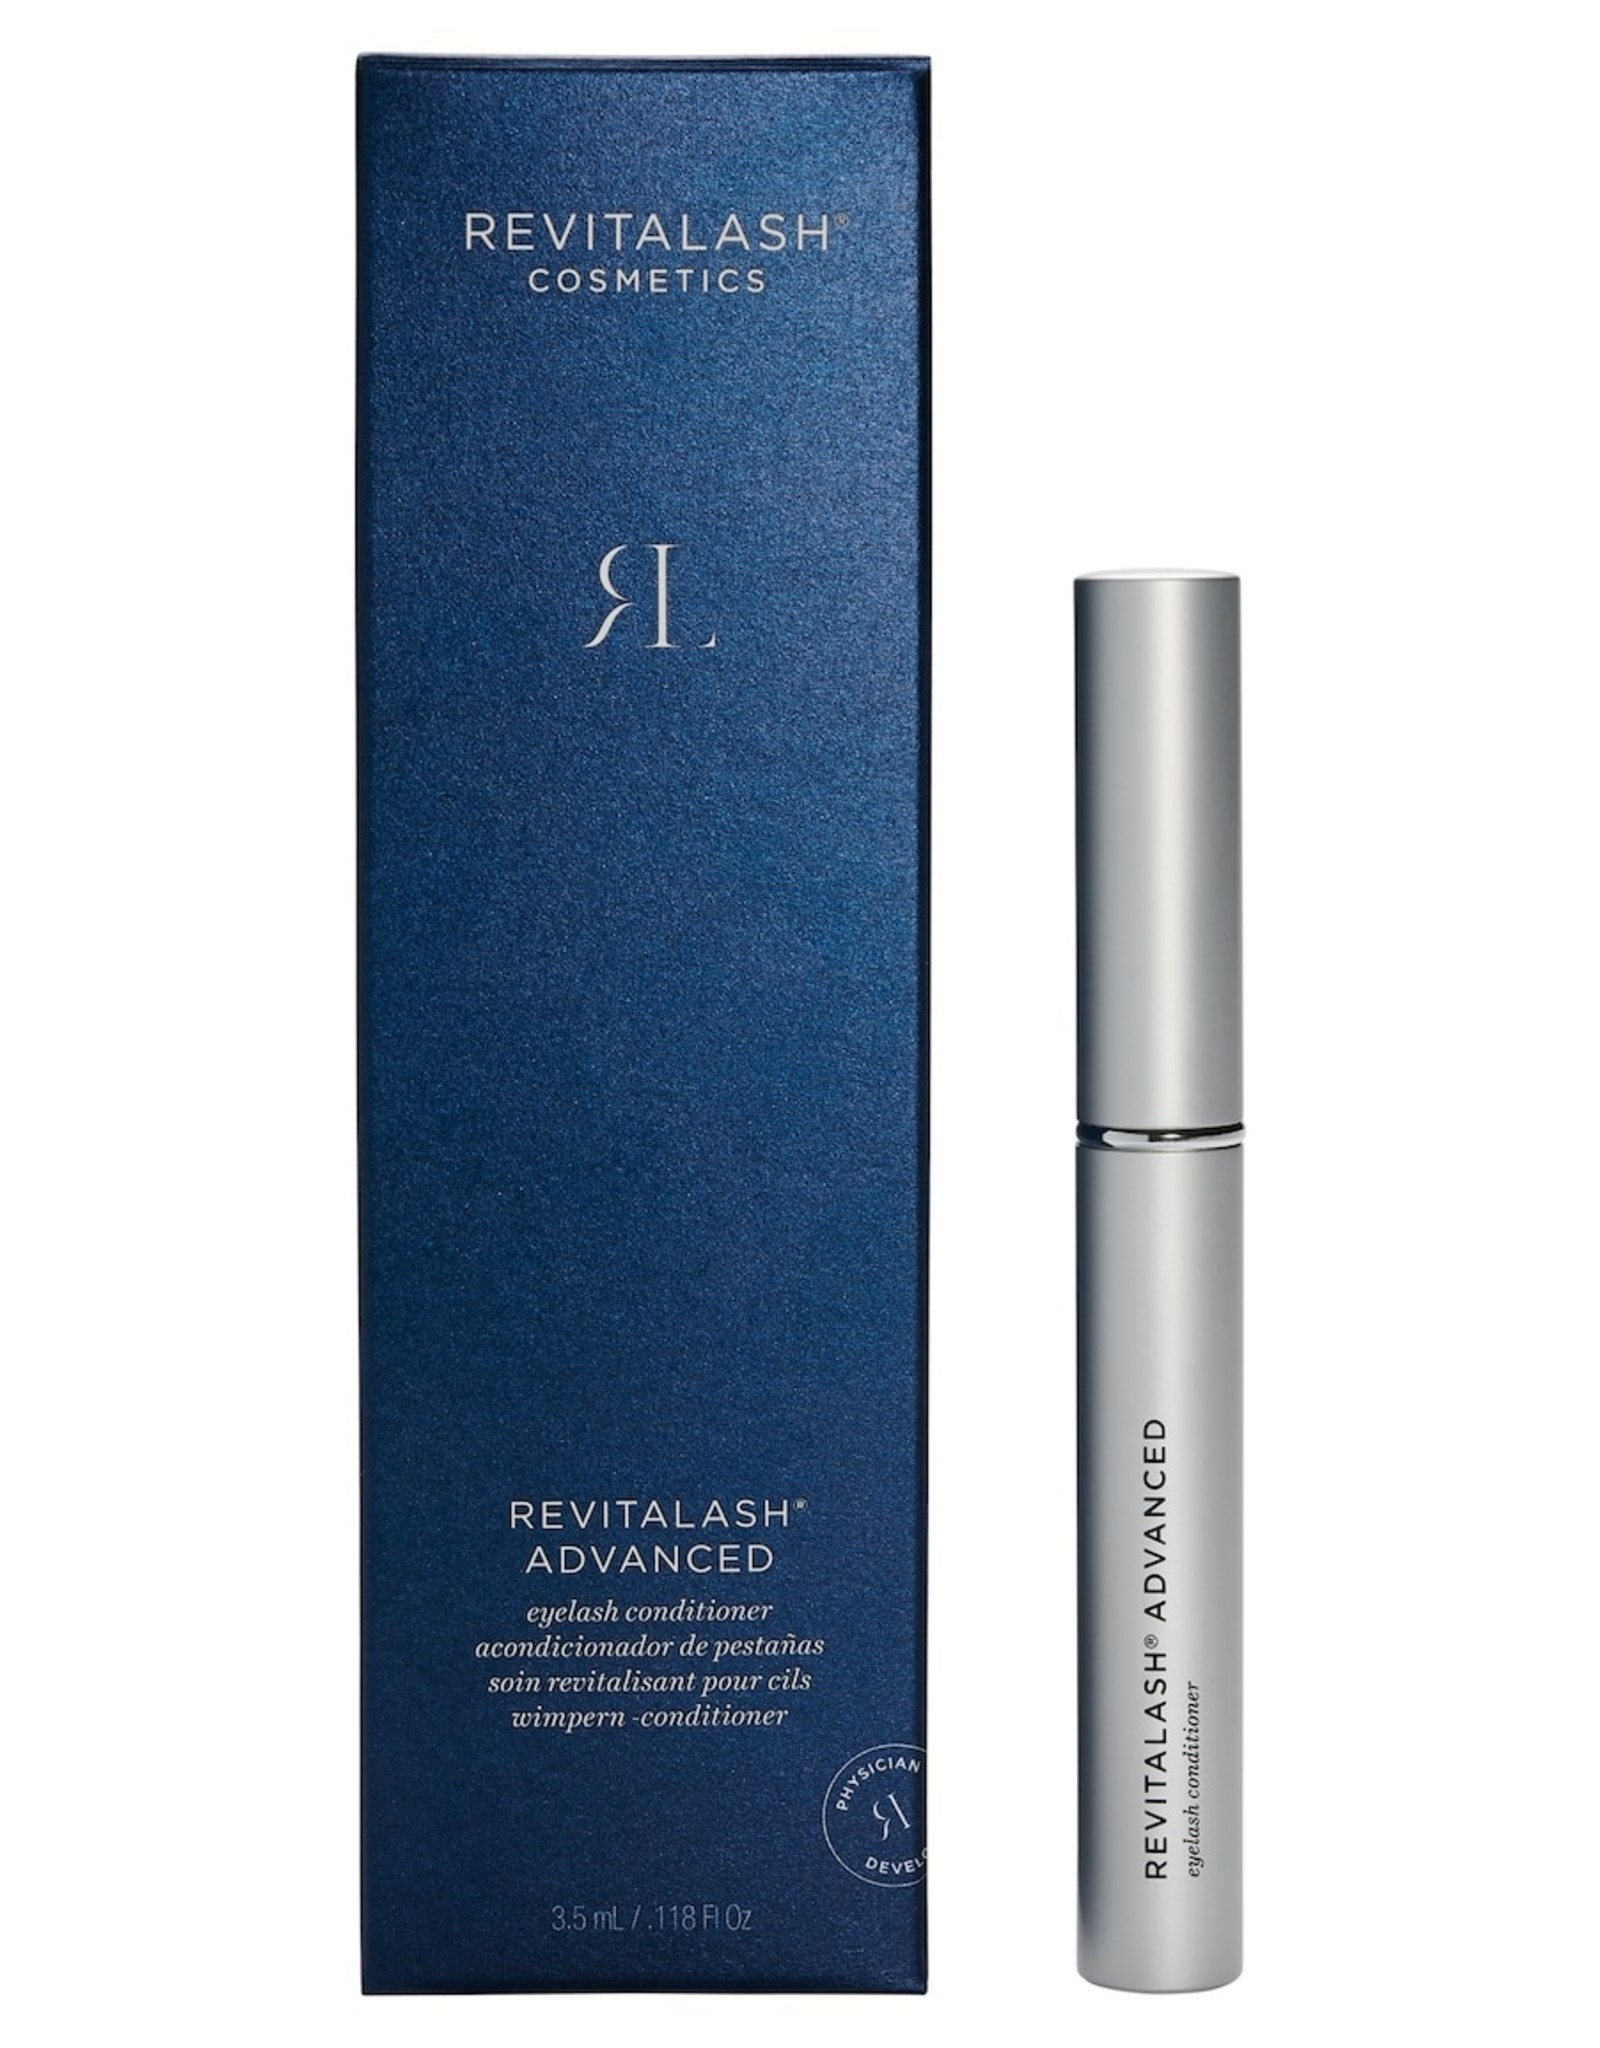 Revitalash Cosmetics RevitaLash ® Advanced 3.5ml